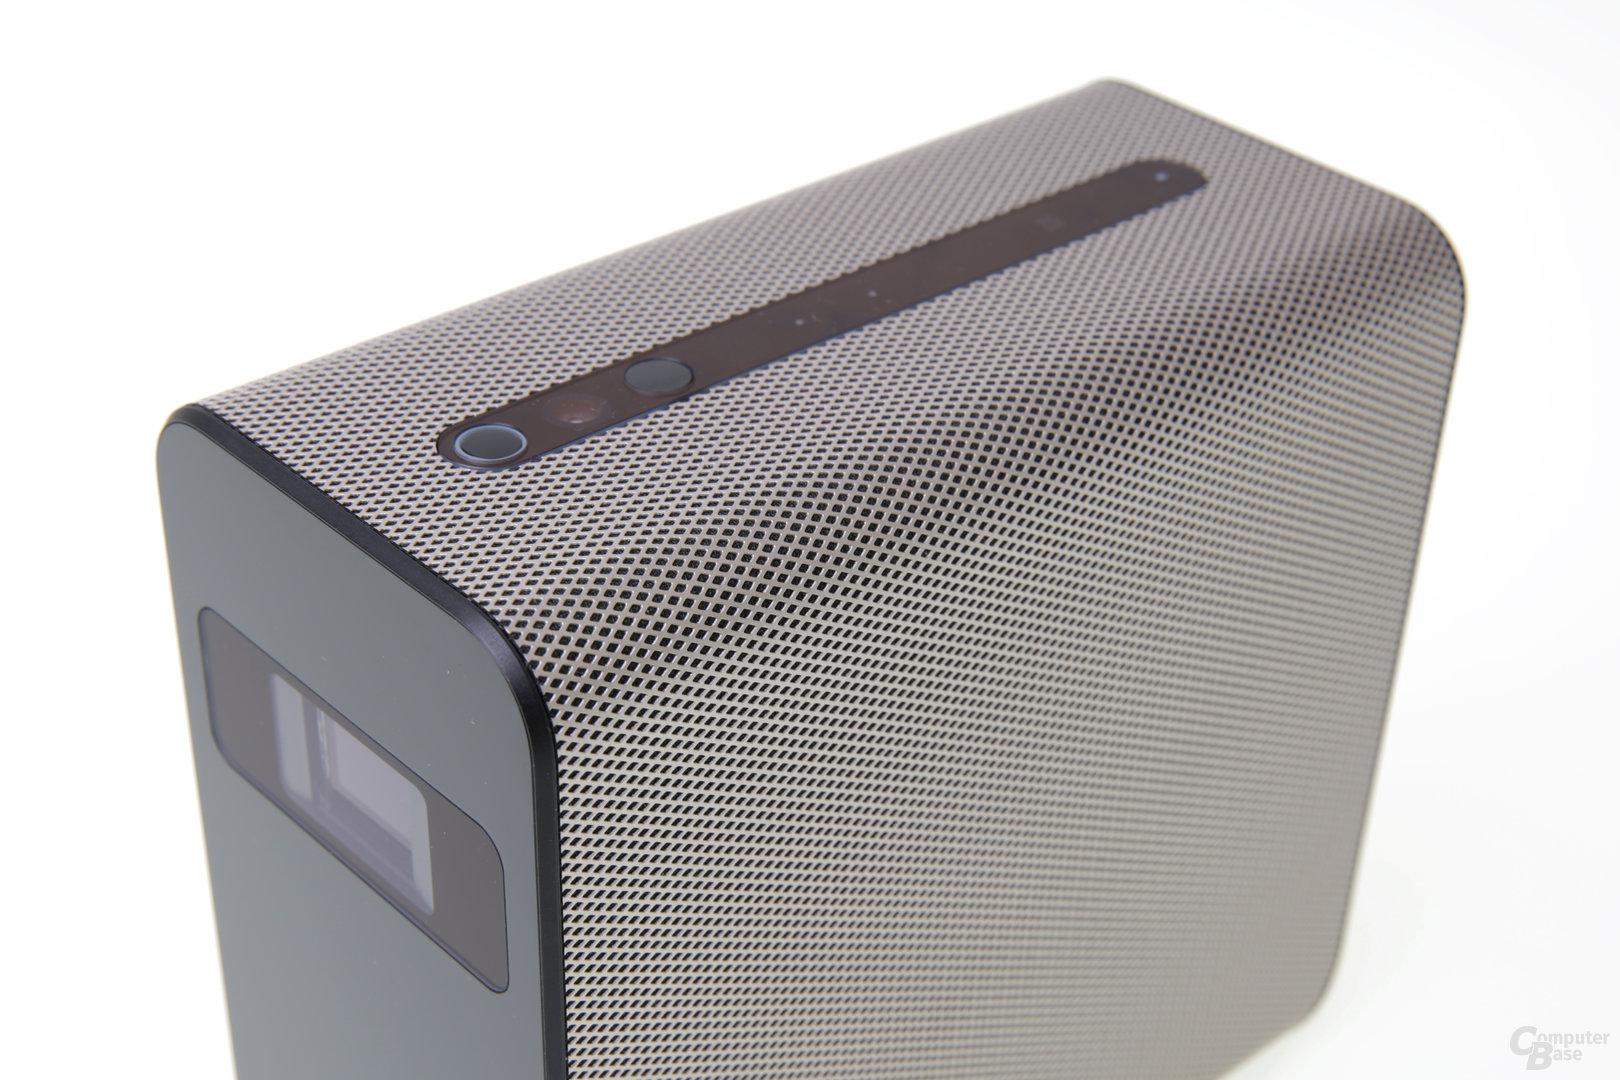 Mesh-Gitter-Design mit versteckten Stereo-Lautsprechern